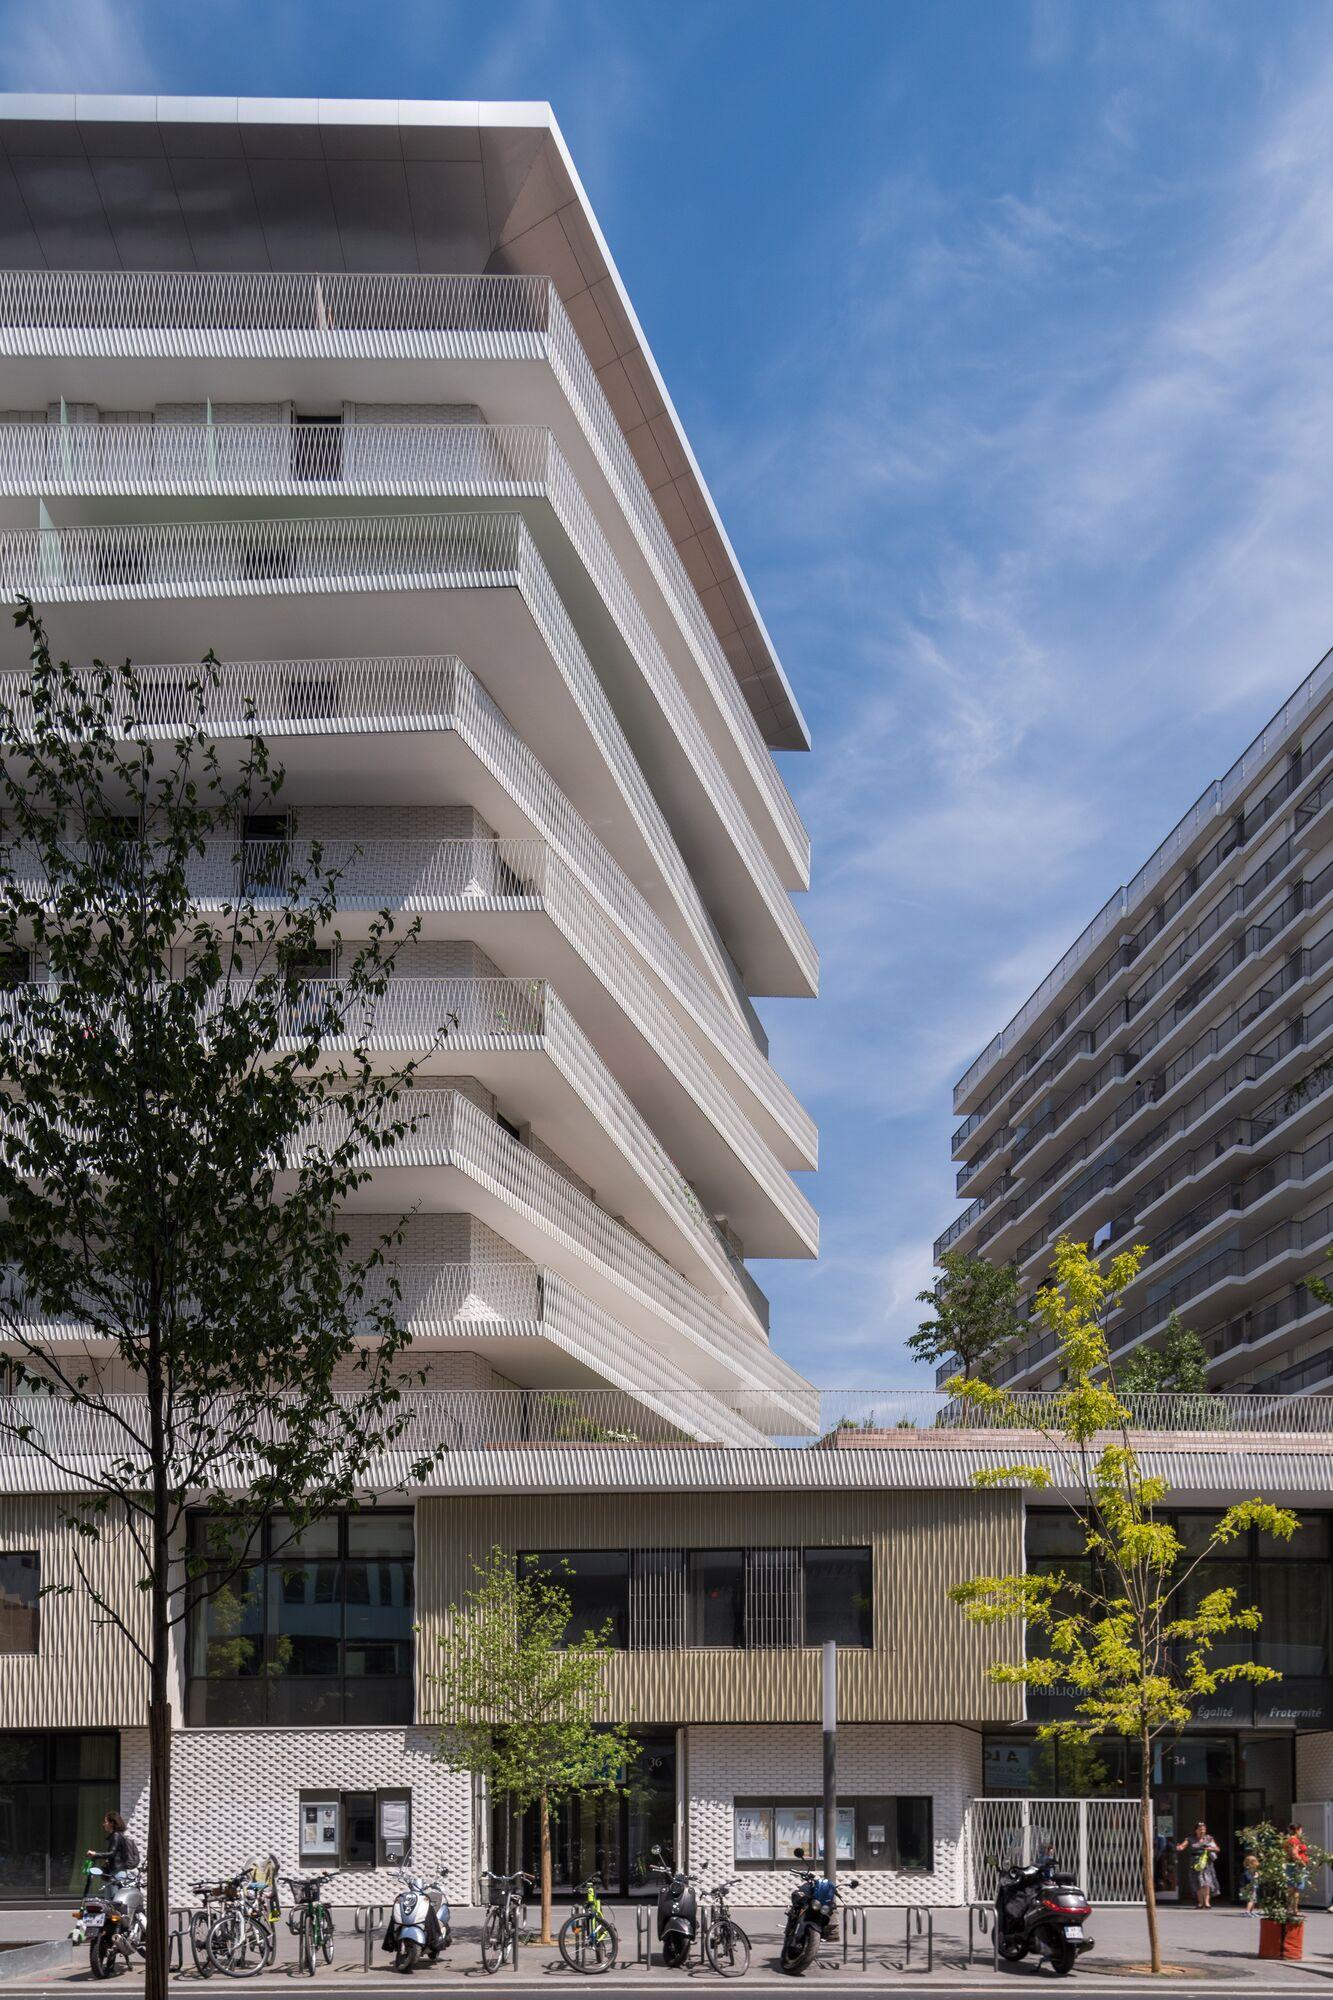 В Україні б не прижилося: в Парижі збудували соціальне житло з гарними великими асиметричними балконами.